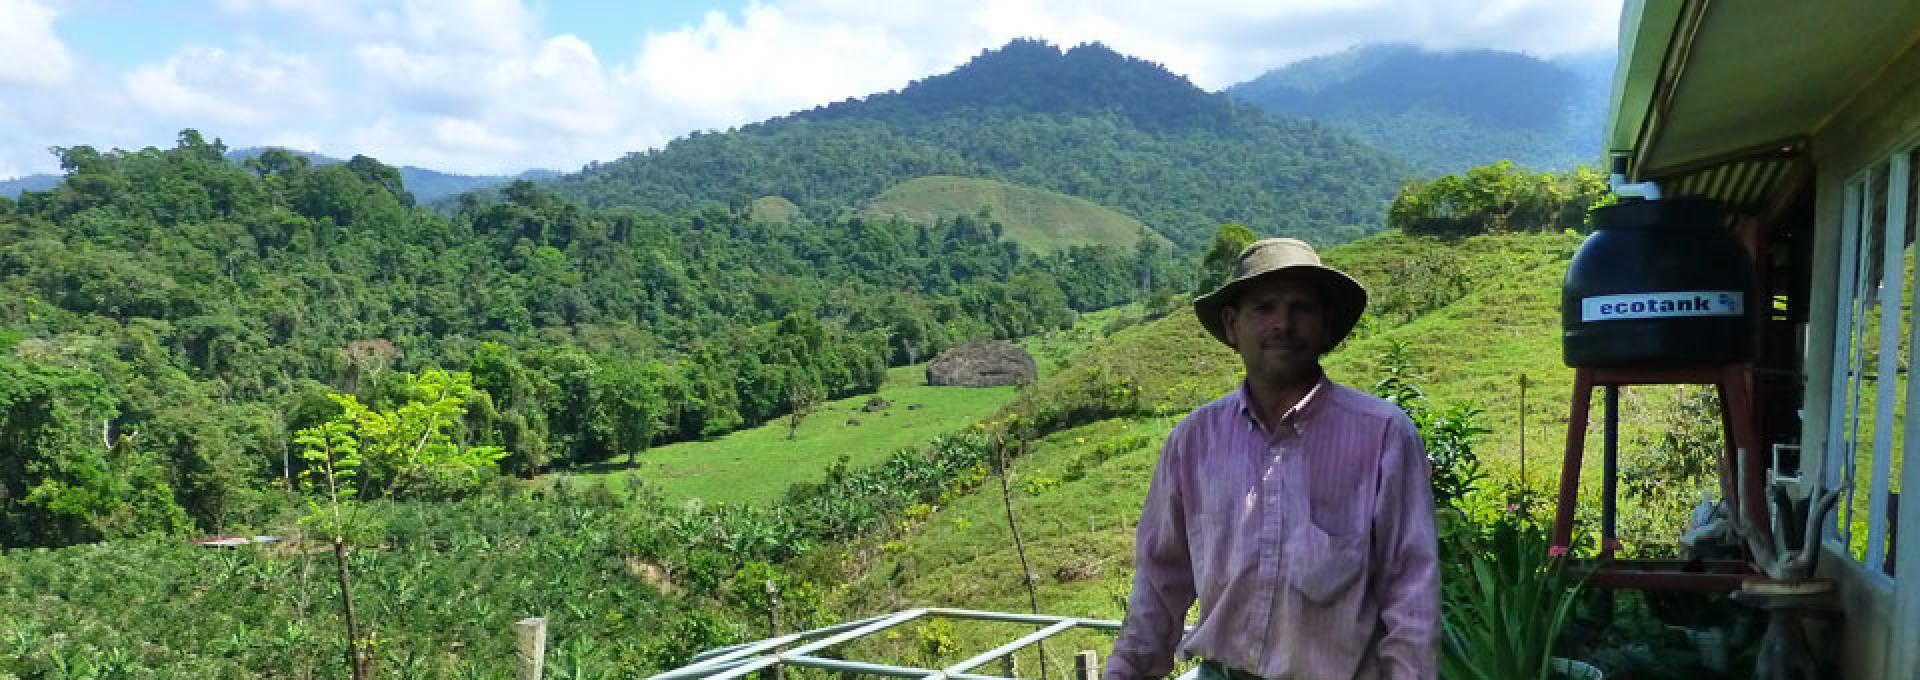 Volunteer in Sustainable Farming